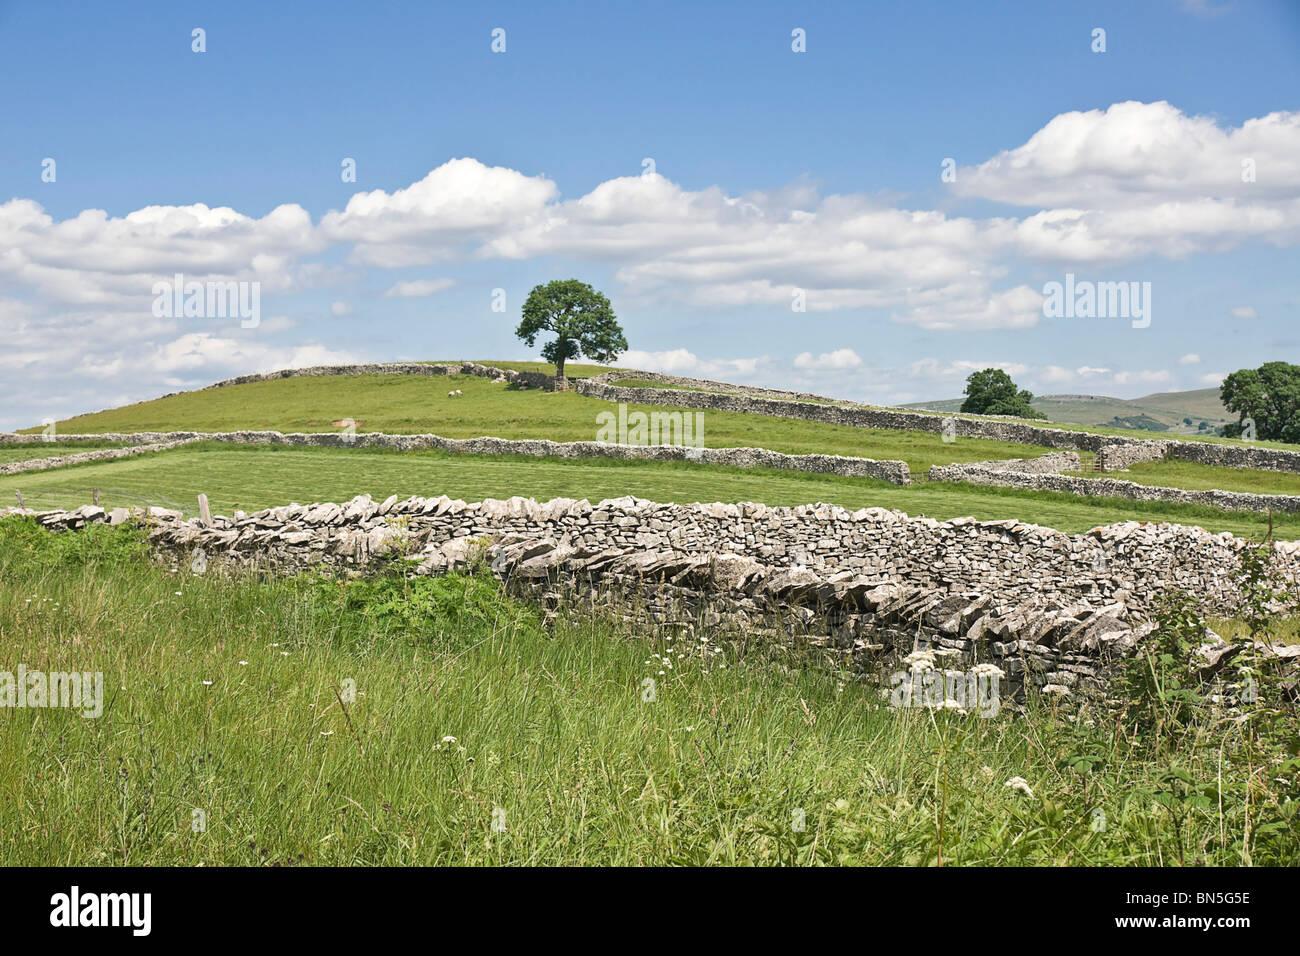 Walls and farmland in Upper Eden Valley near Sedbergh, Cumbria - Stock Image